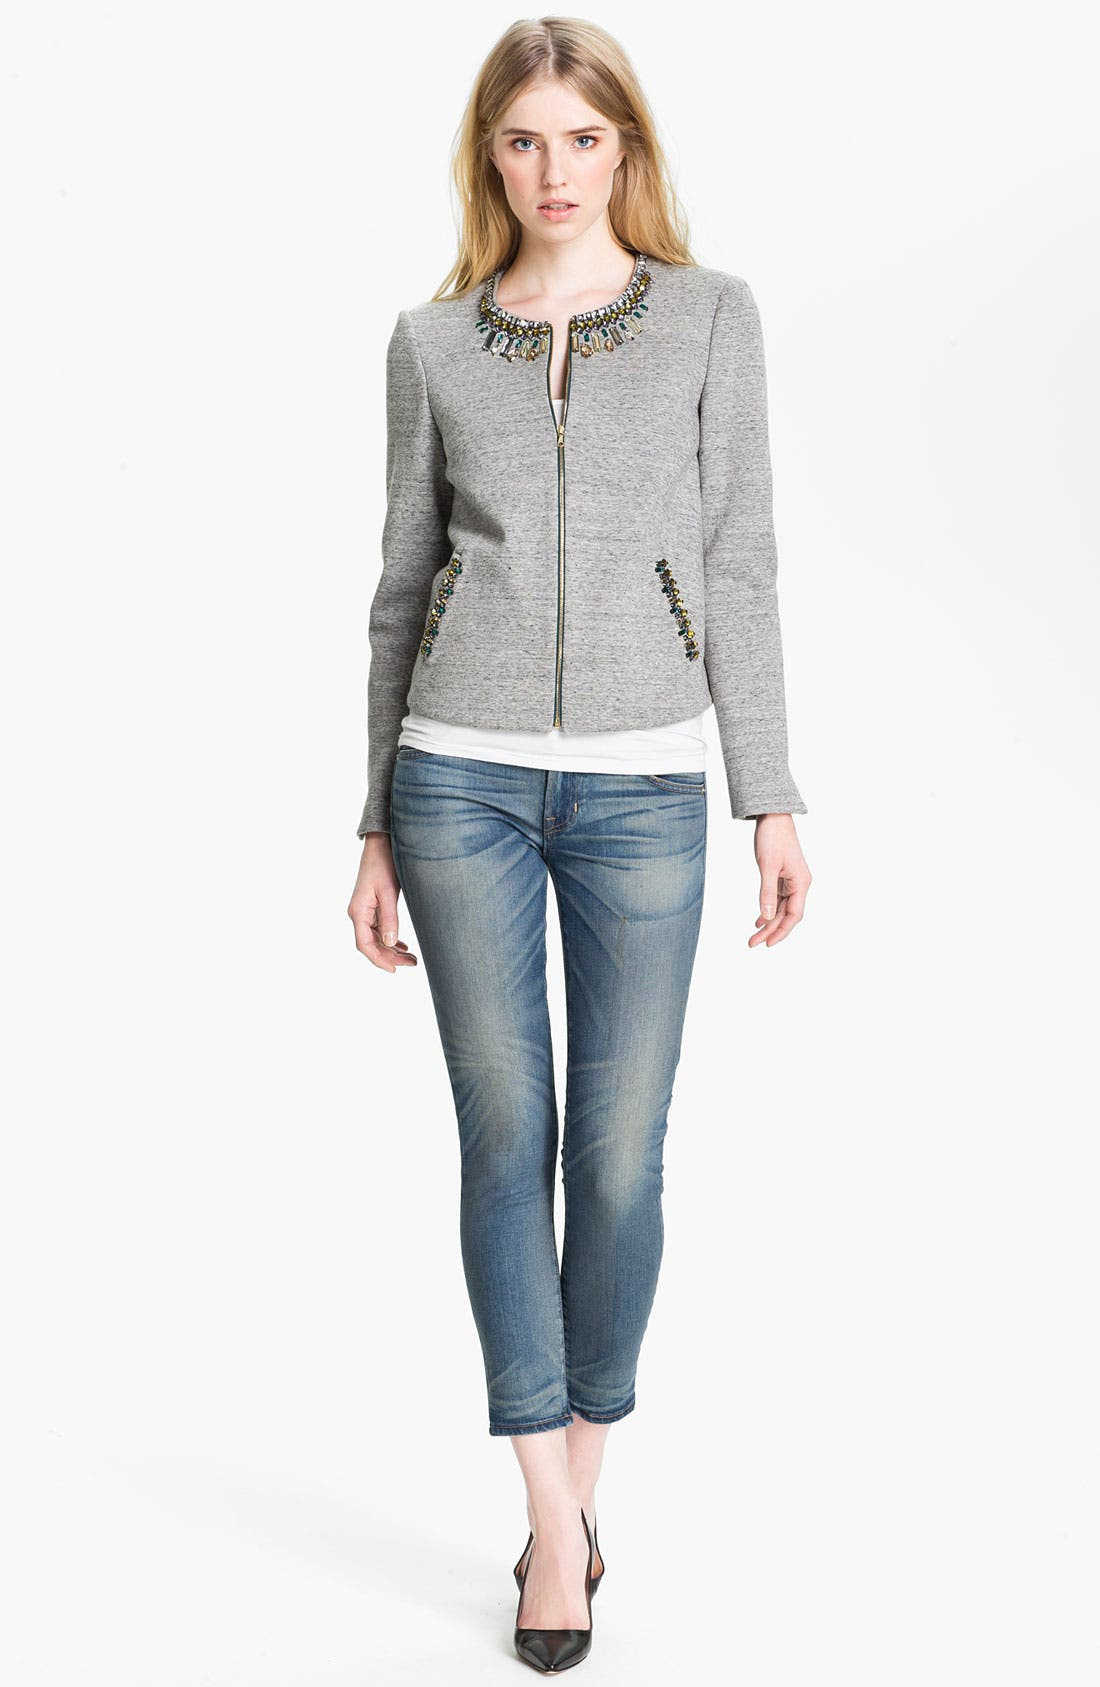 Main Image - Elizabeth and James Jacket & TEXTILE Jeans